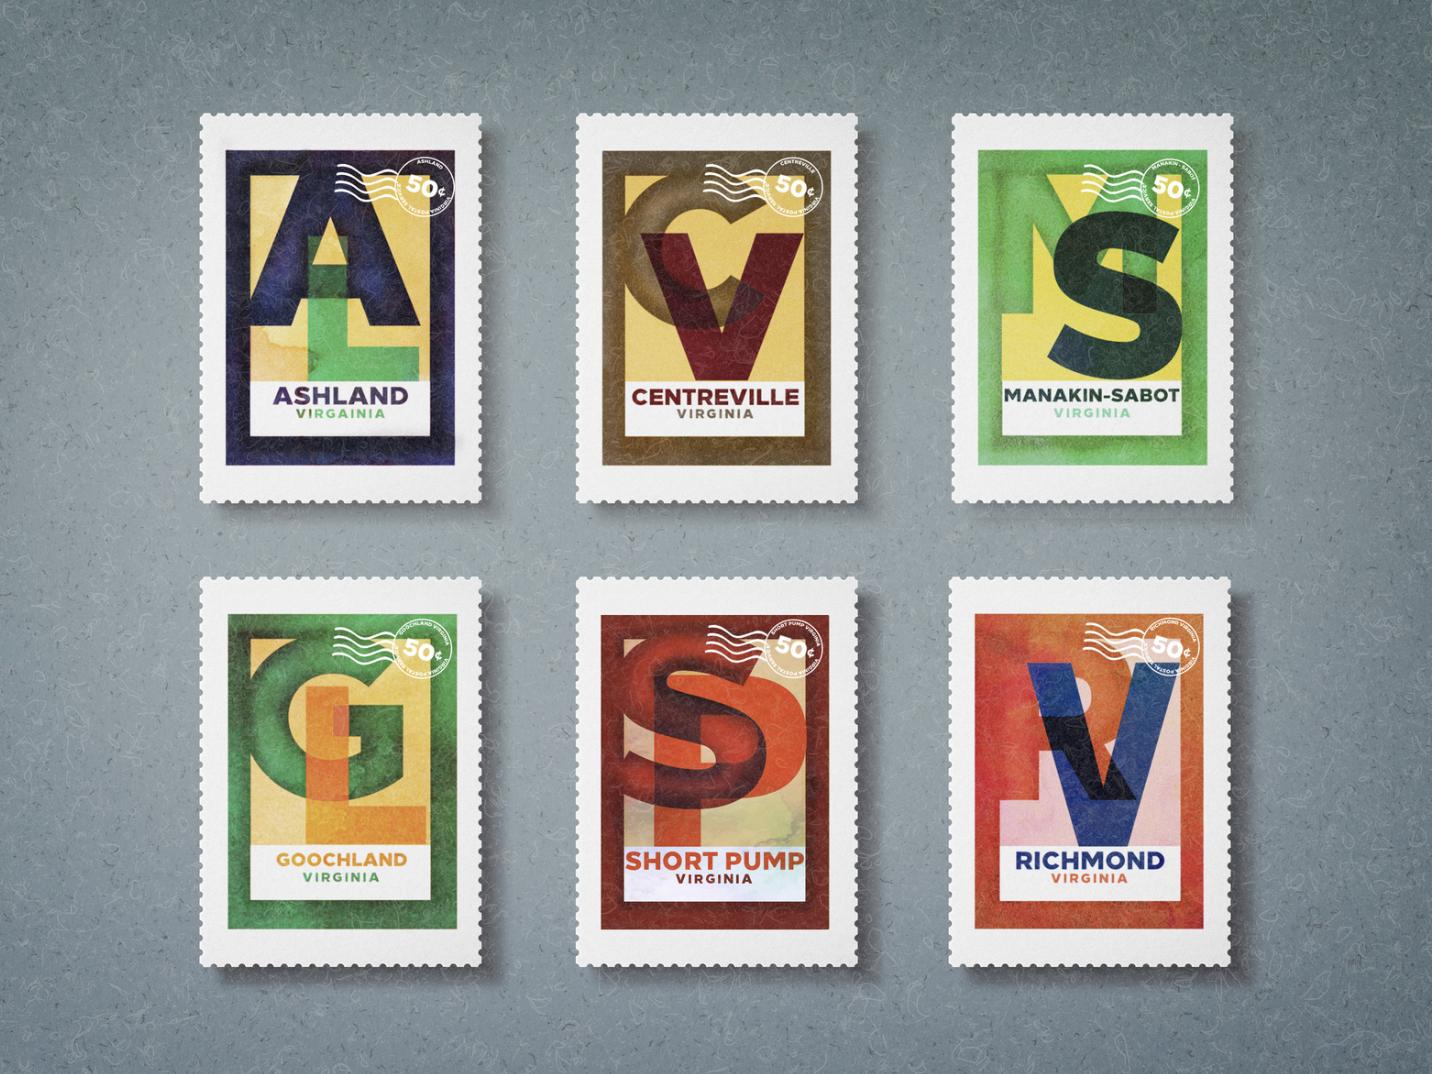 Virginia Towns Set of Stamps typography stamp graphic design stamps designs rva short pump goochland manakin-sabot centreville ashland virginia richmond